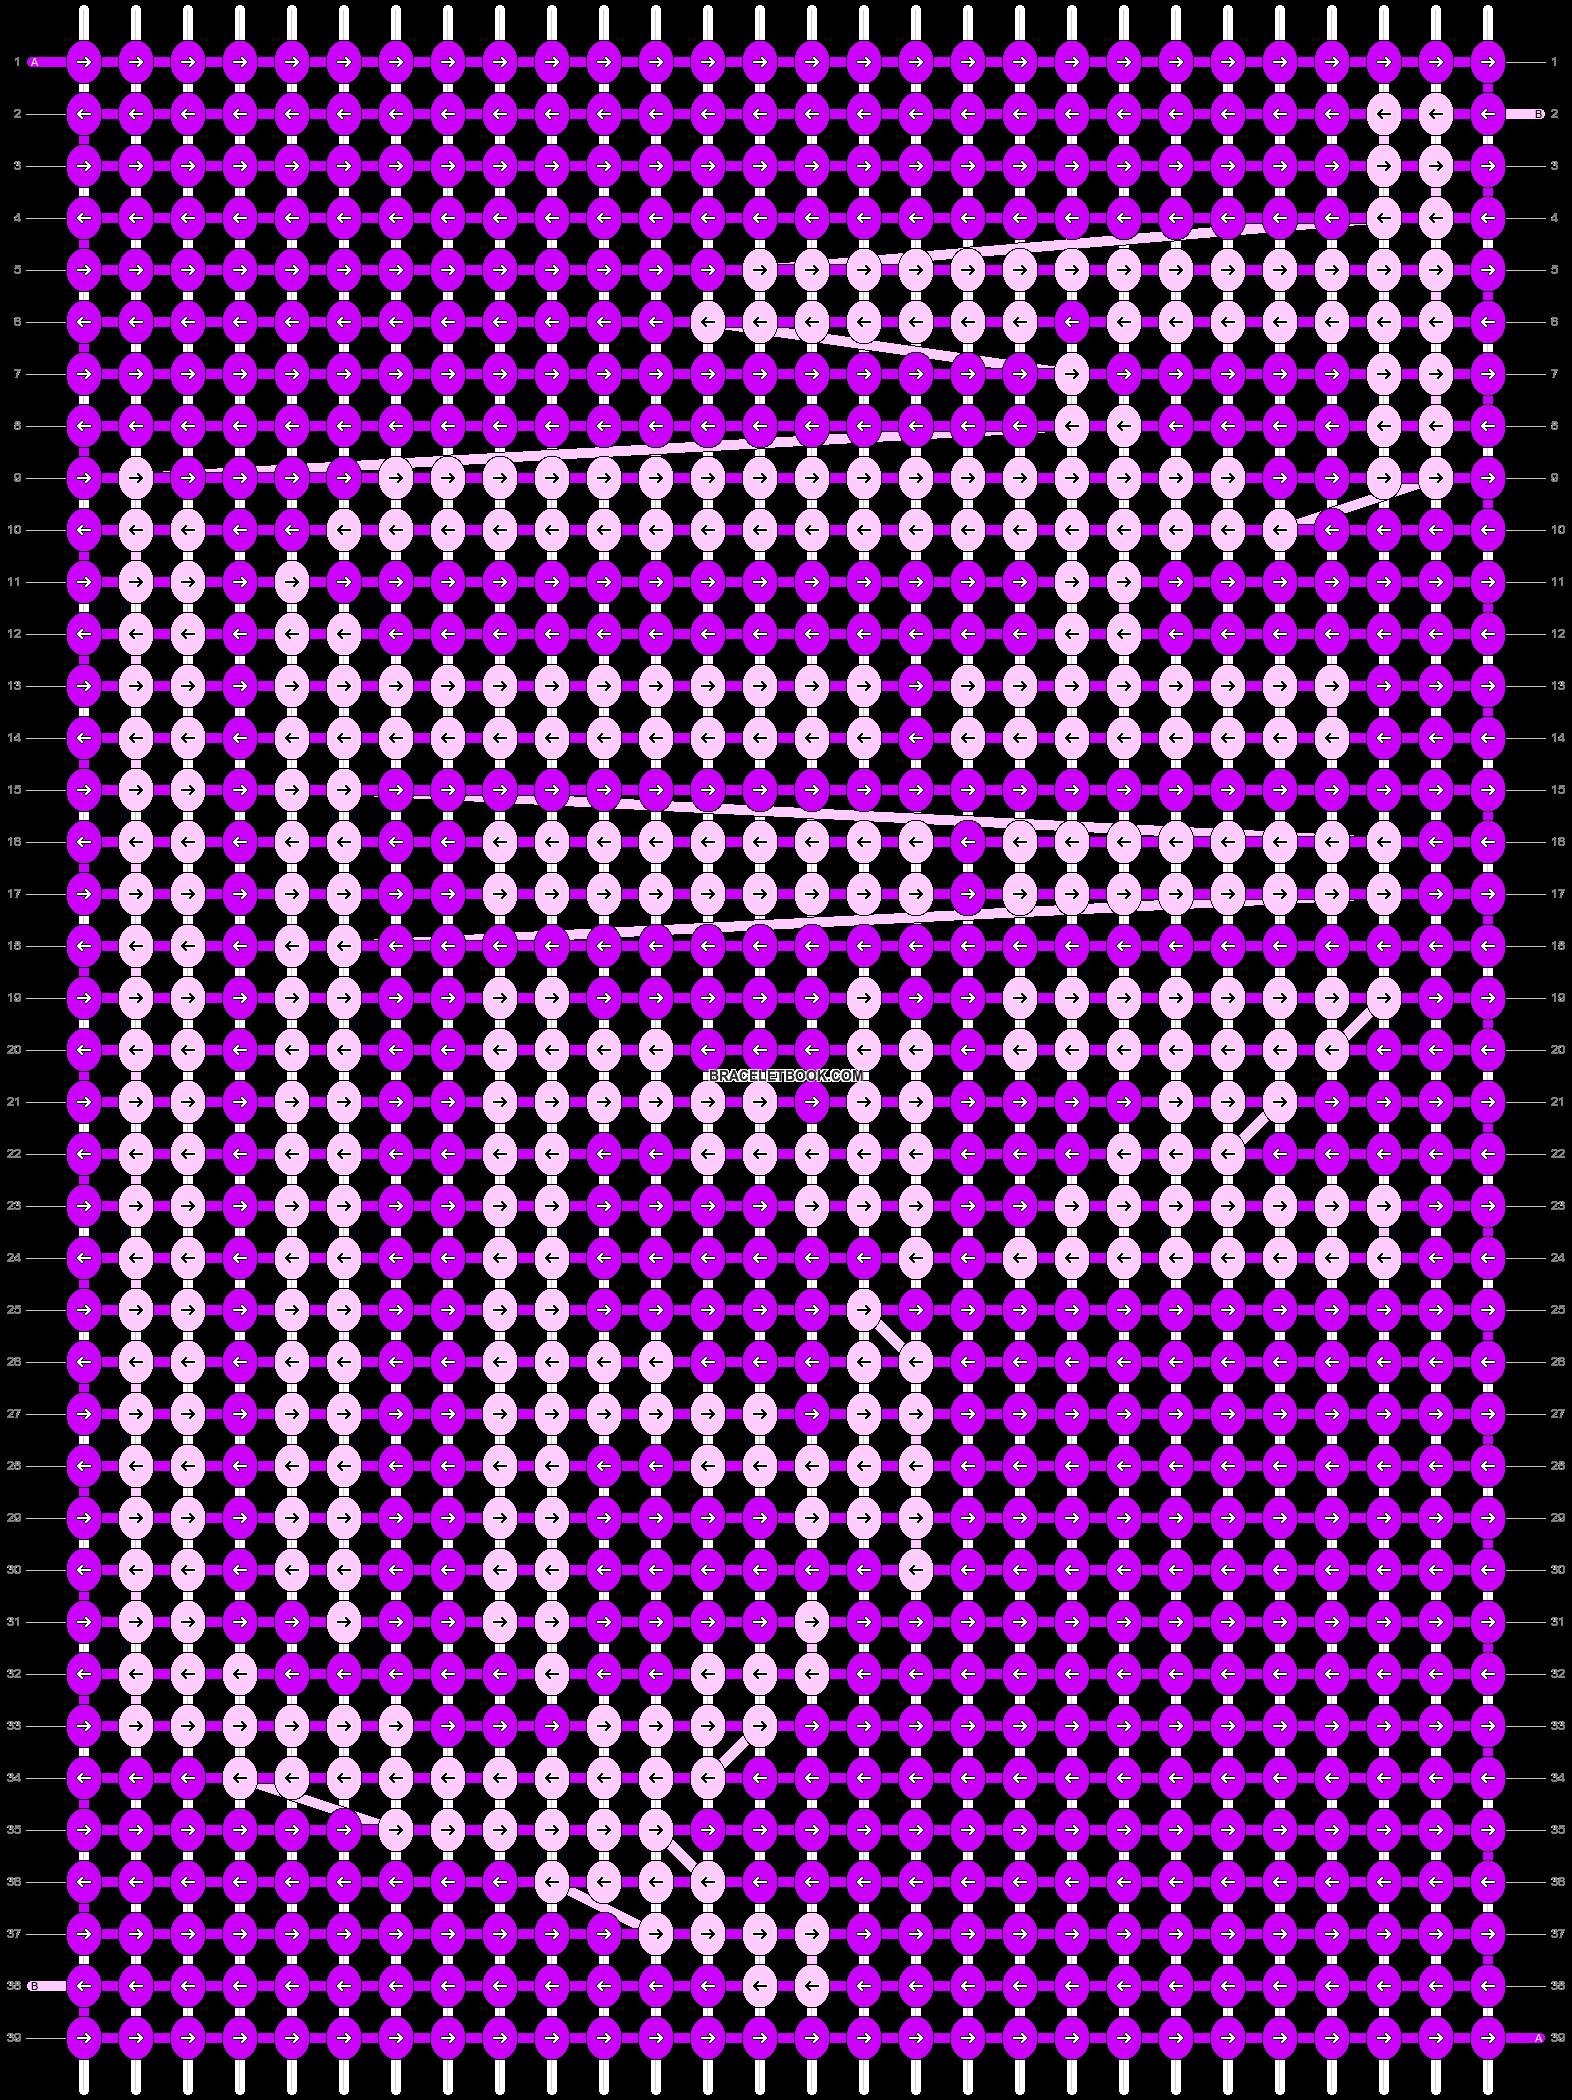 Alpha pattern #85033 pattern